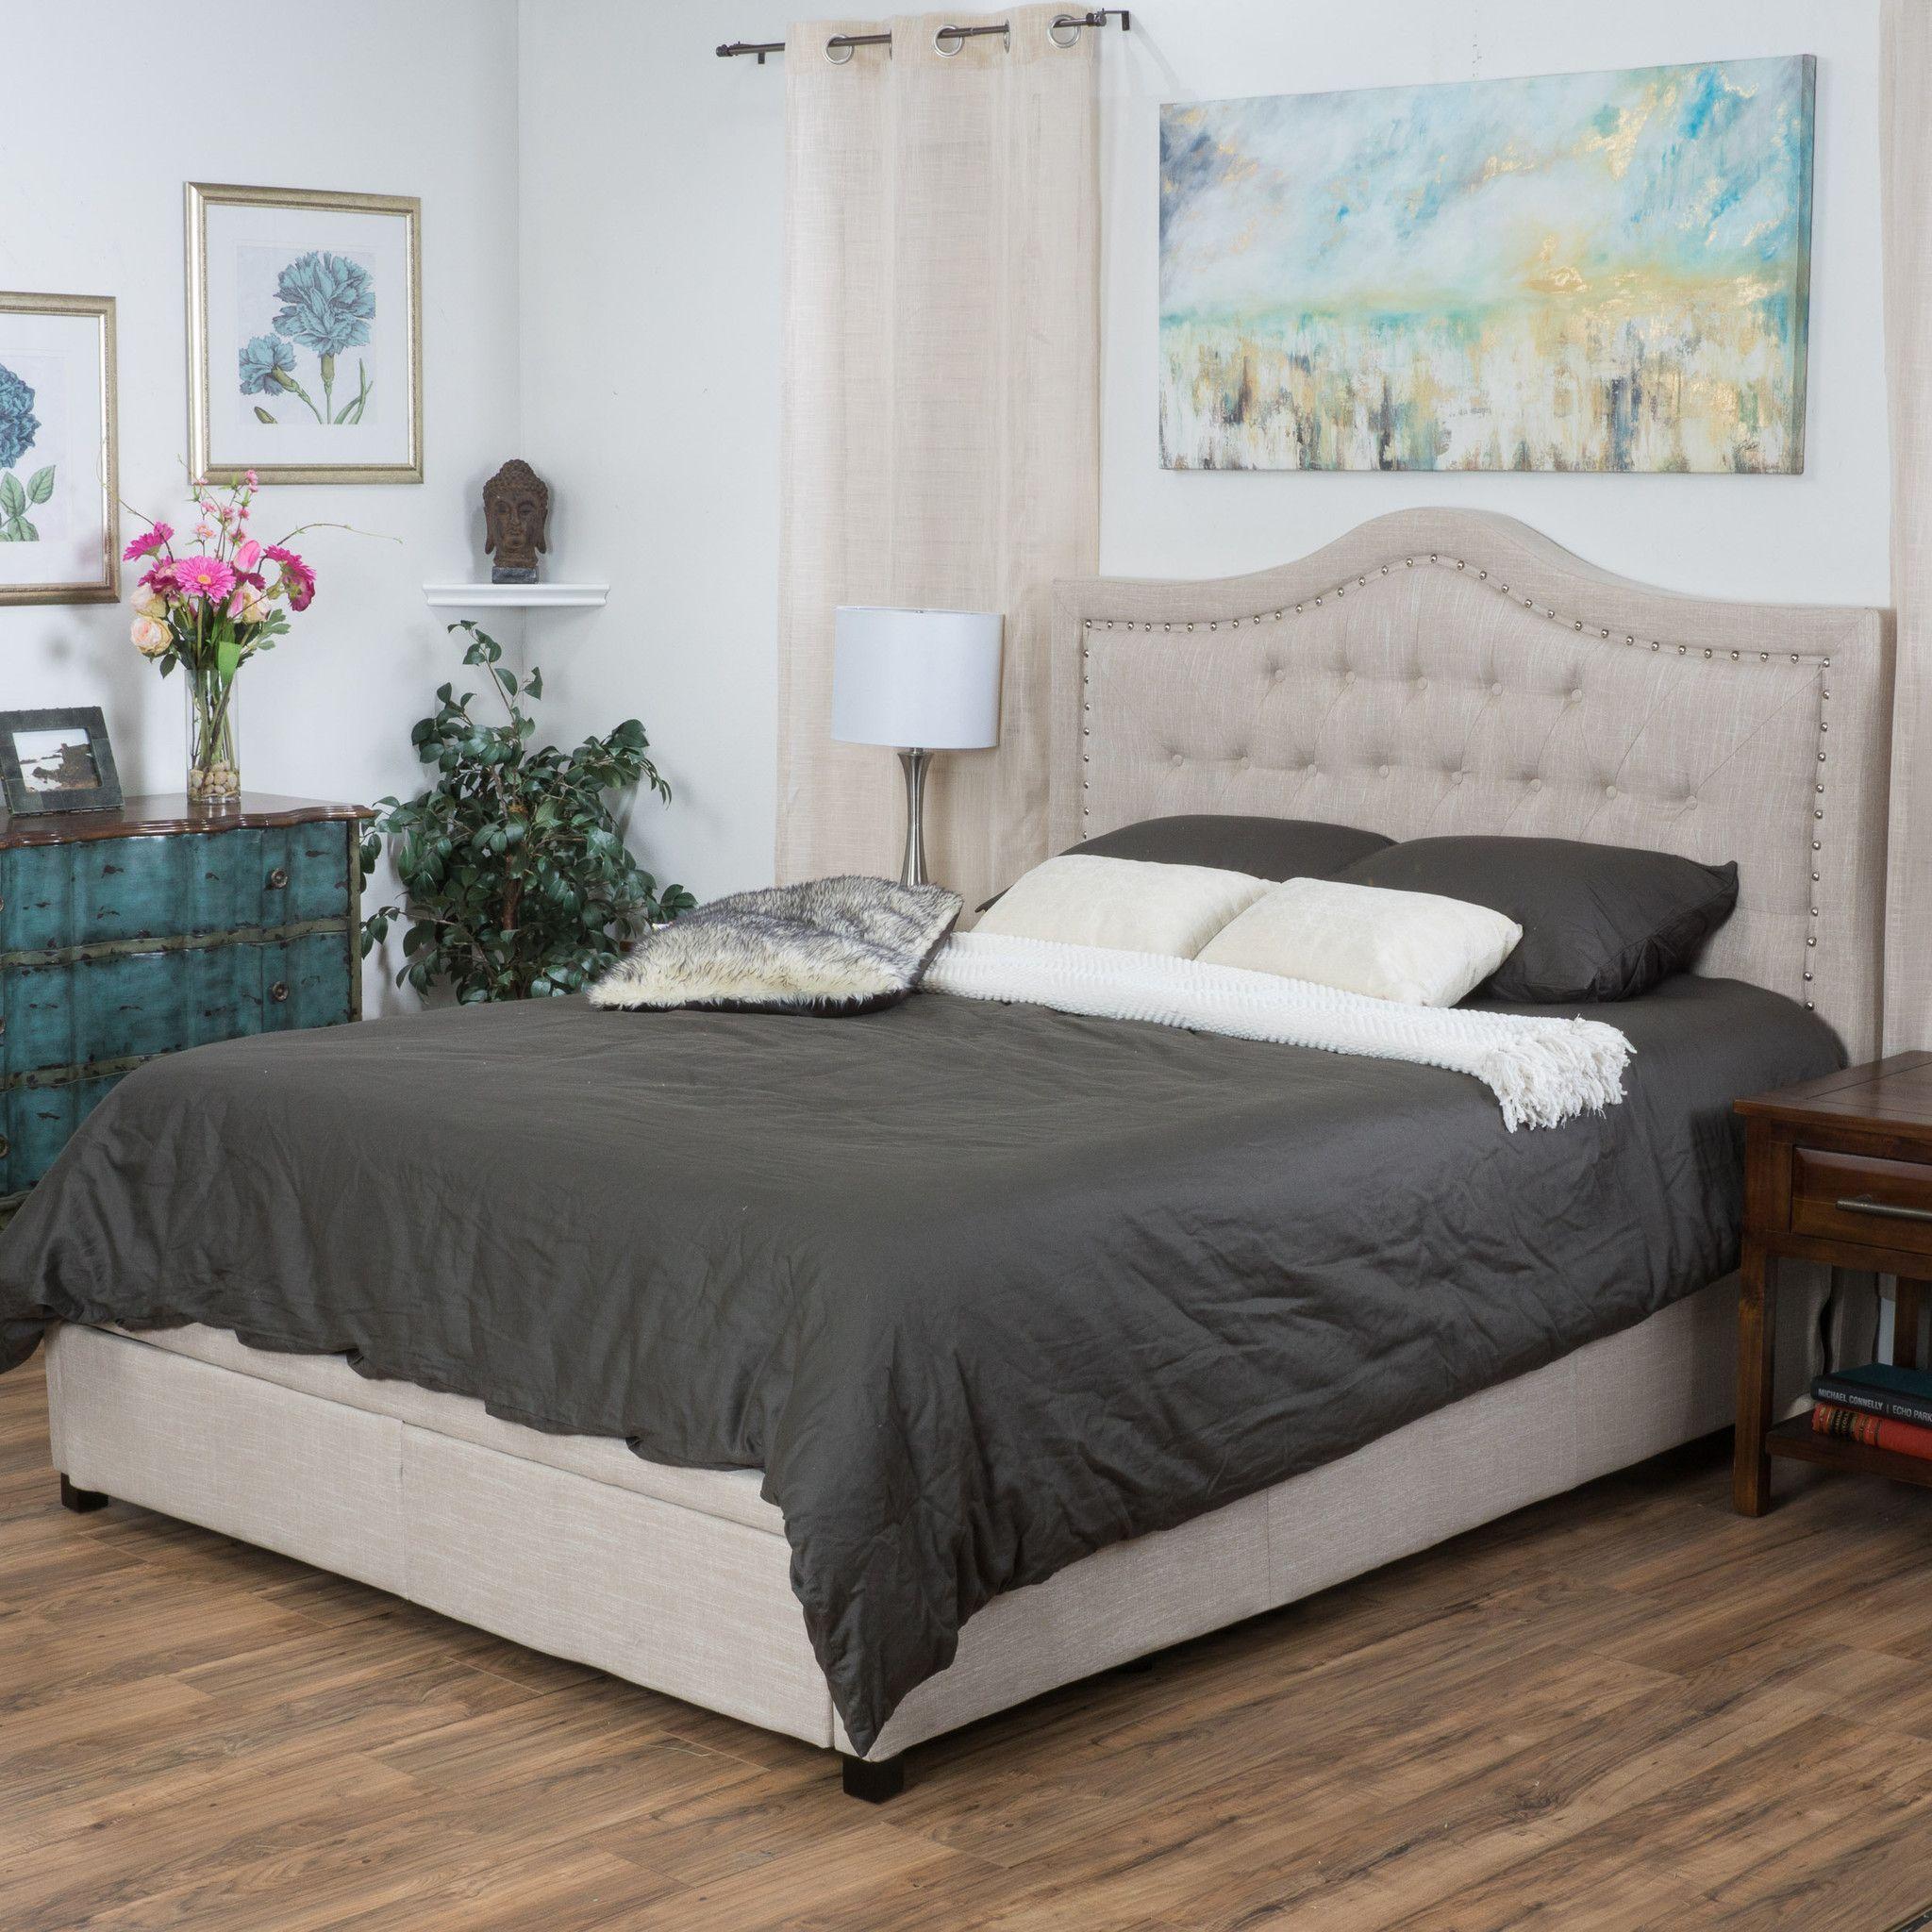 geragrand fully upholstered light beige fabric king size bed with drawers - Diy Kingsizekopfteil Plne